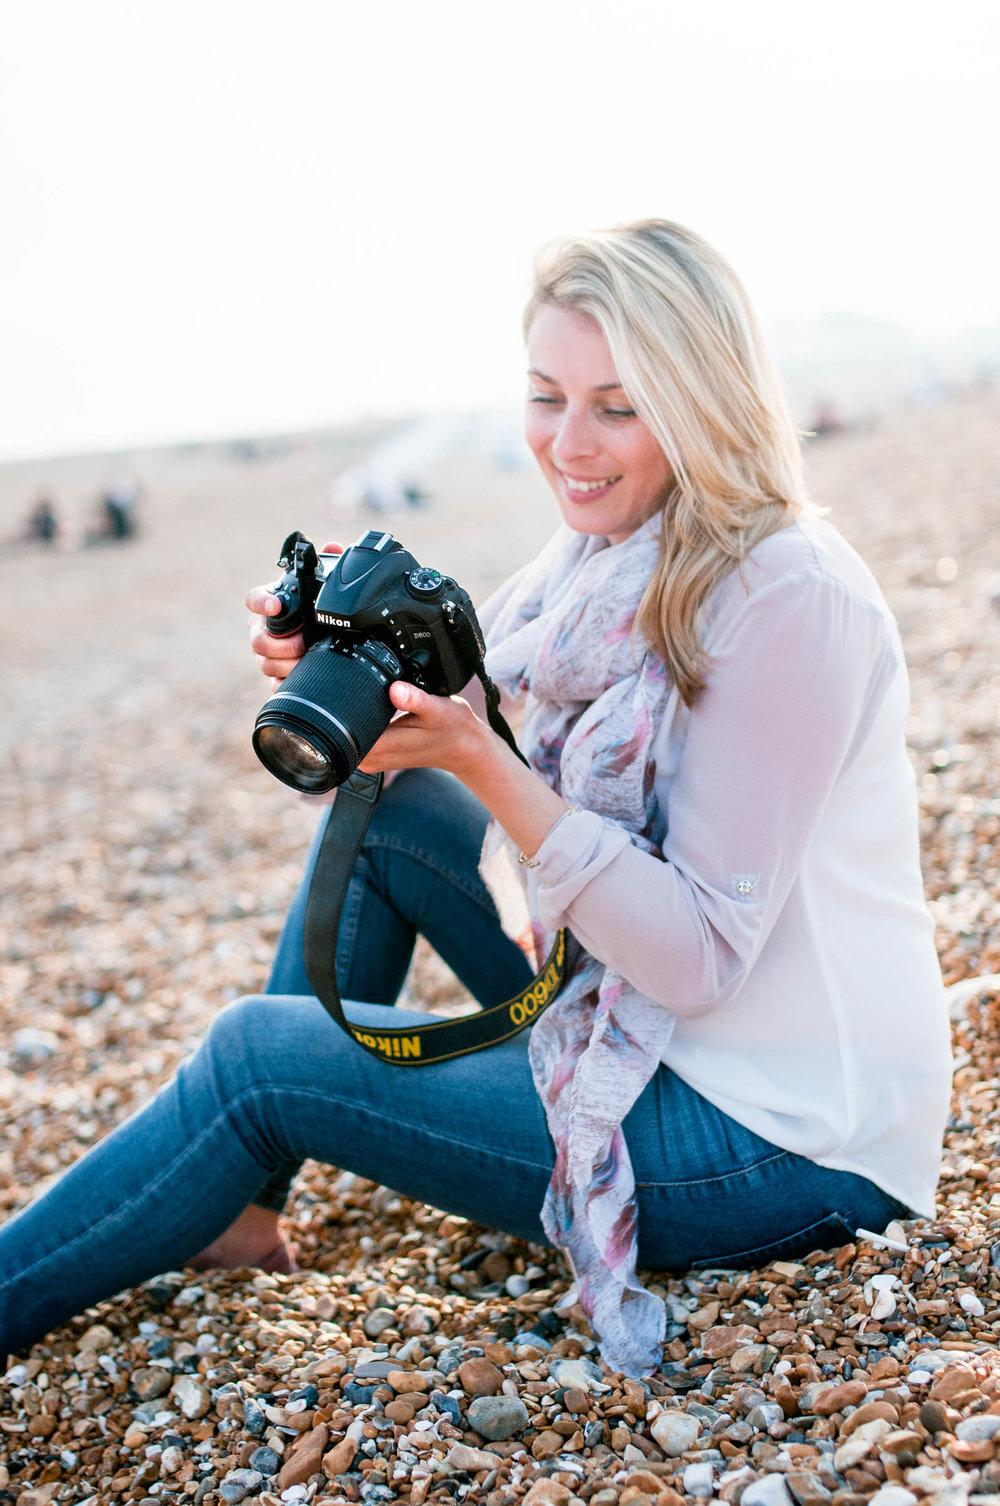 London & Brighton Portrait Photographer - Magdalena Smolarska Photography-15.jpg